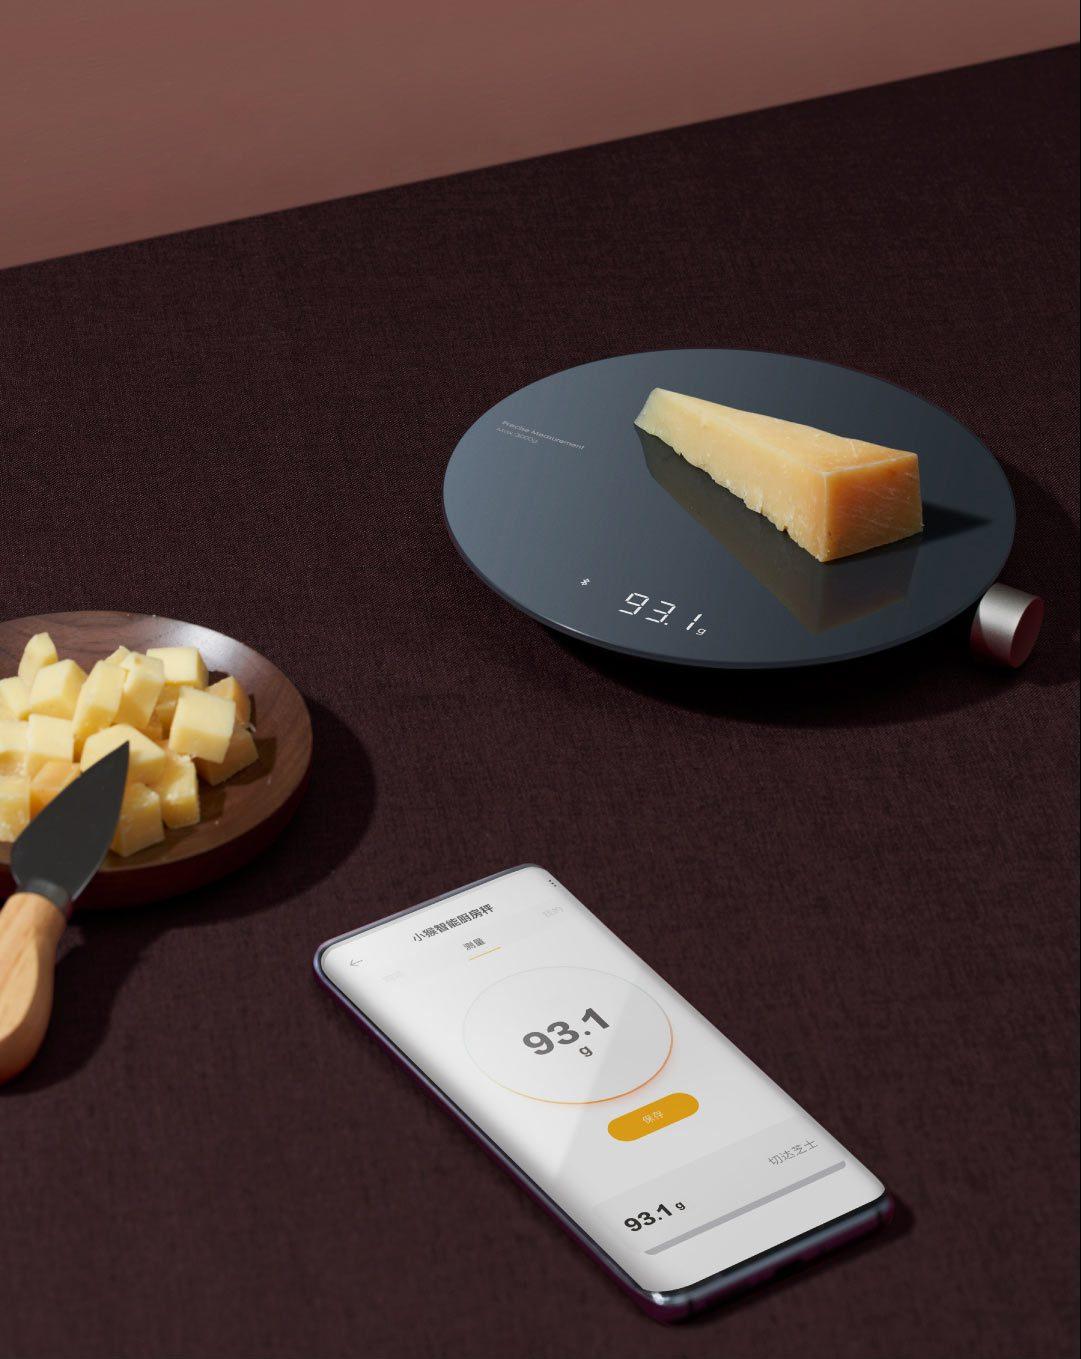 Lo último de Xiaomi es esta báscula de cocina inteligente capaz de contar calorías. Noticias Xiaomi A